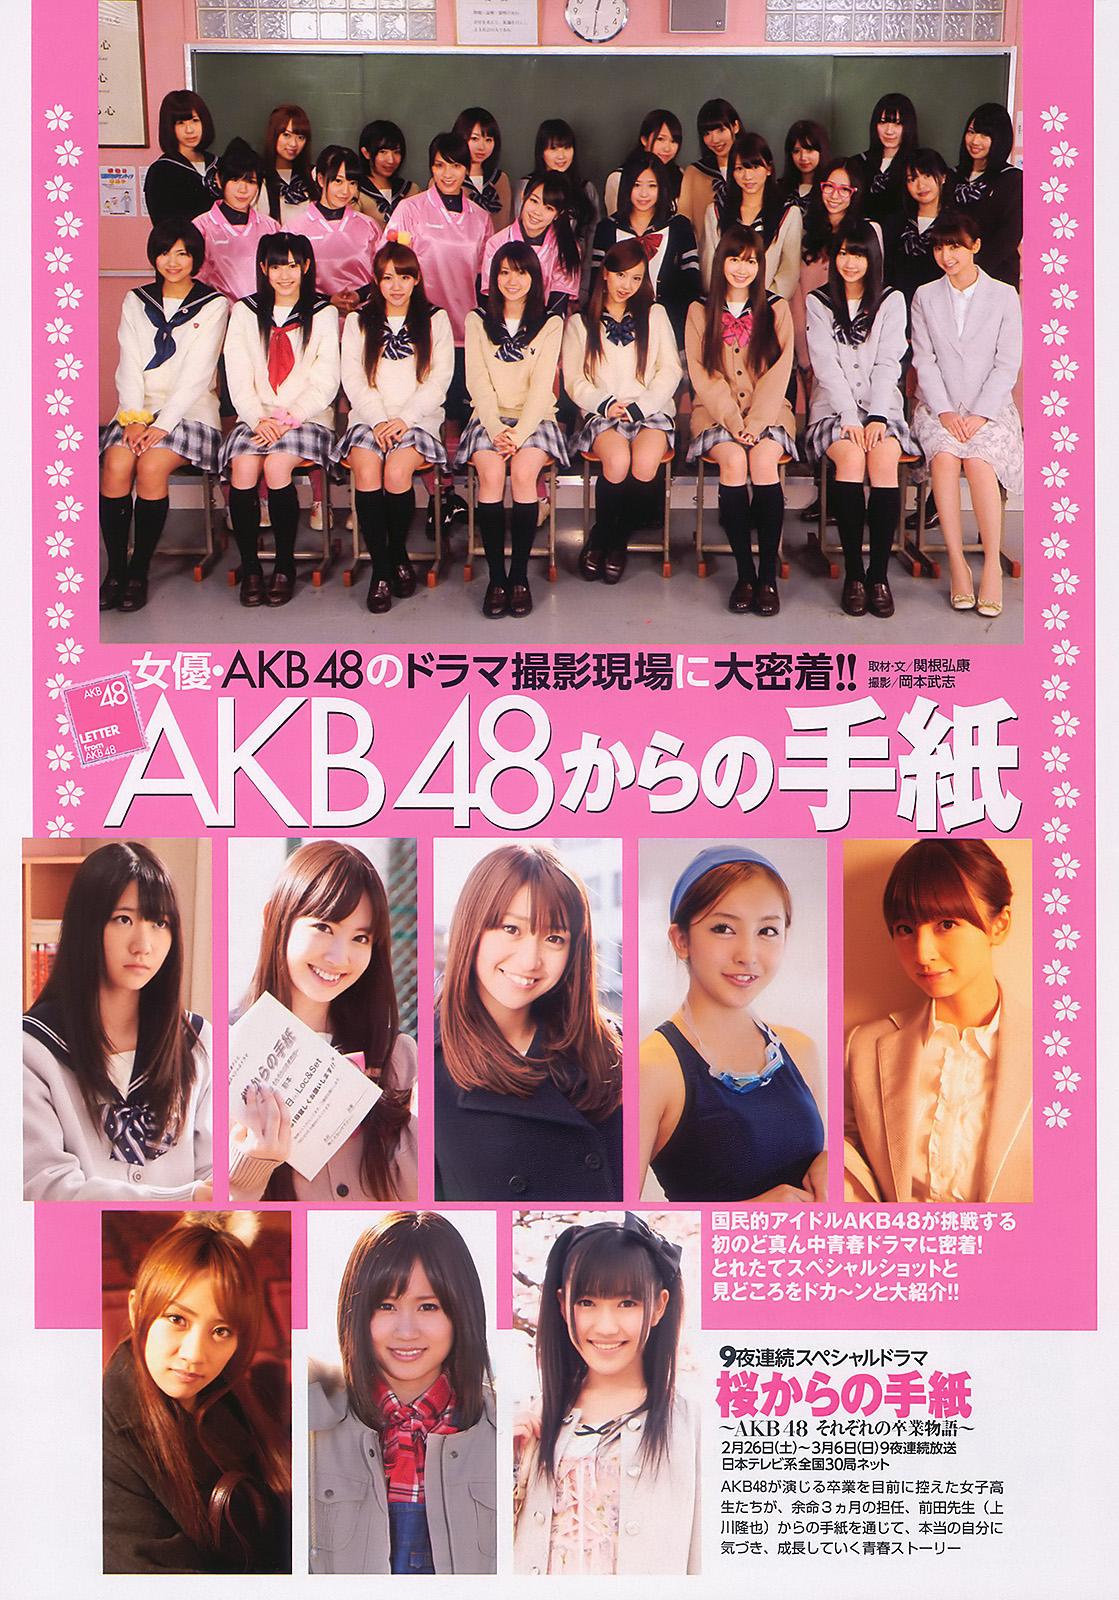 AKB48 - AKB48 - JapaneseClass....